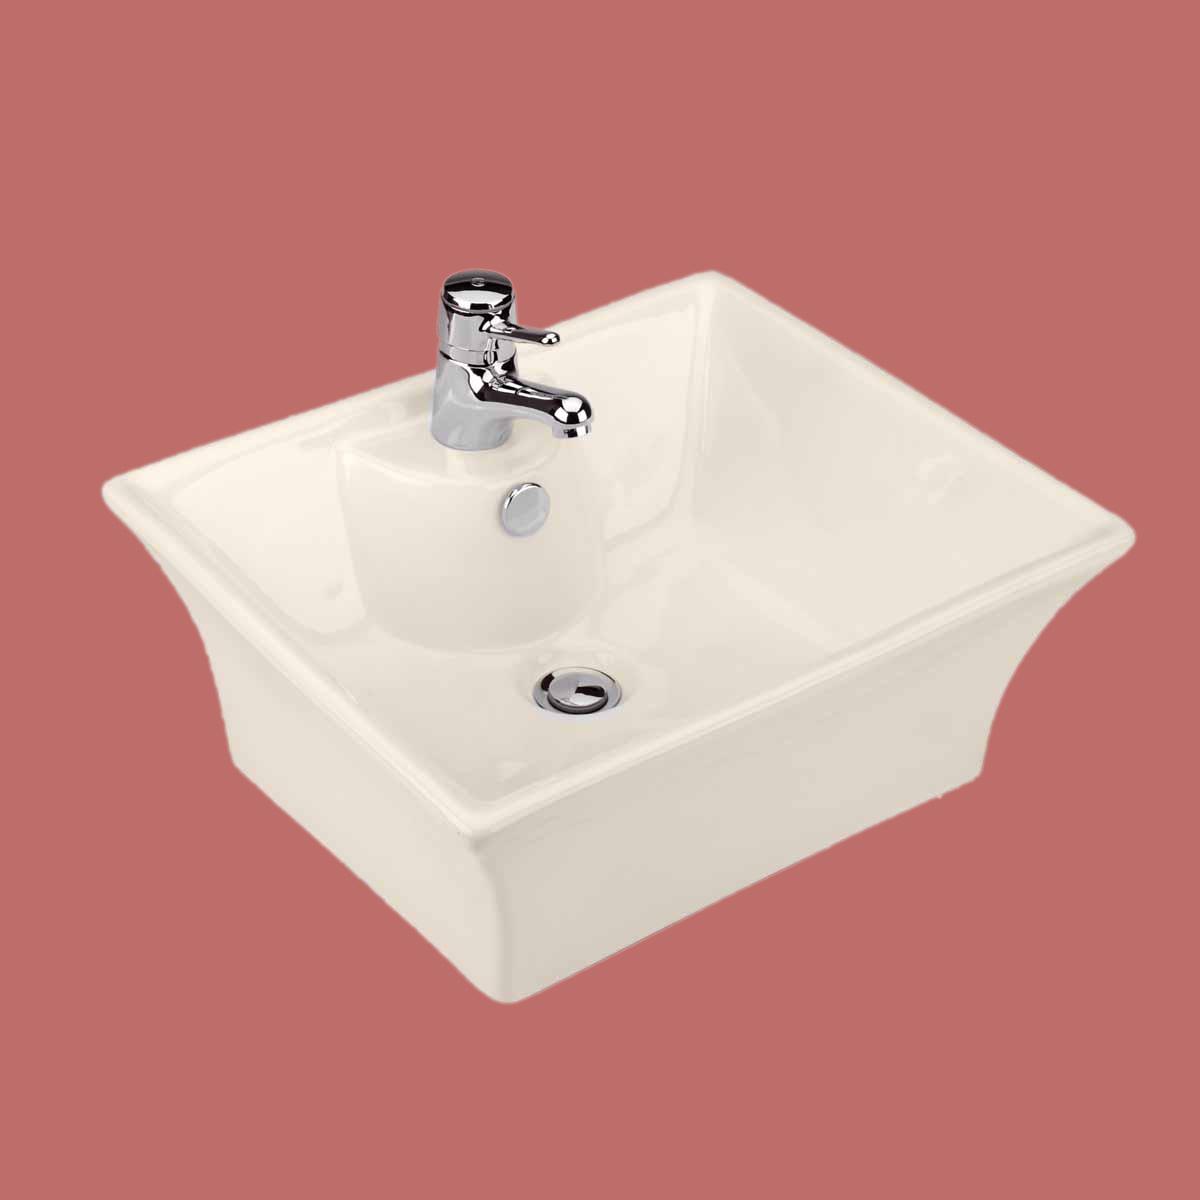 Square Bathroom Sinks : home plumbing bathroom sinks parts small bathroom sinks